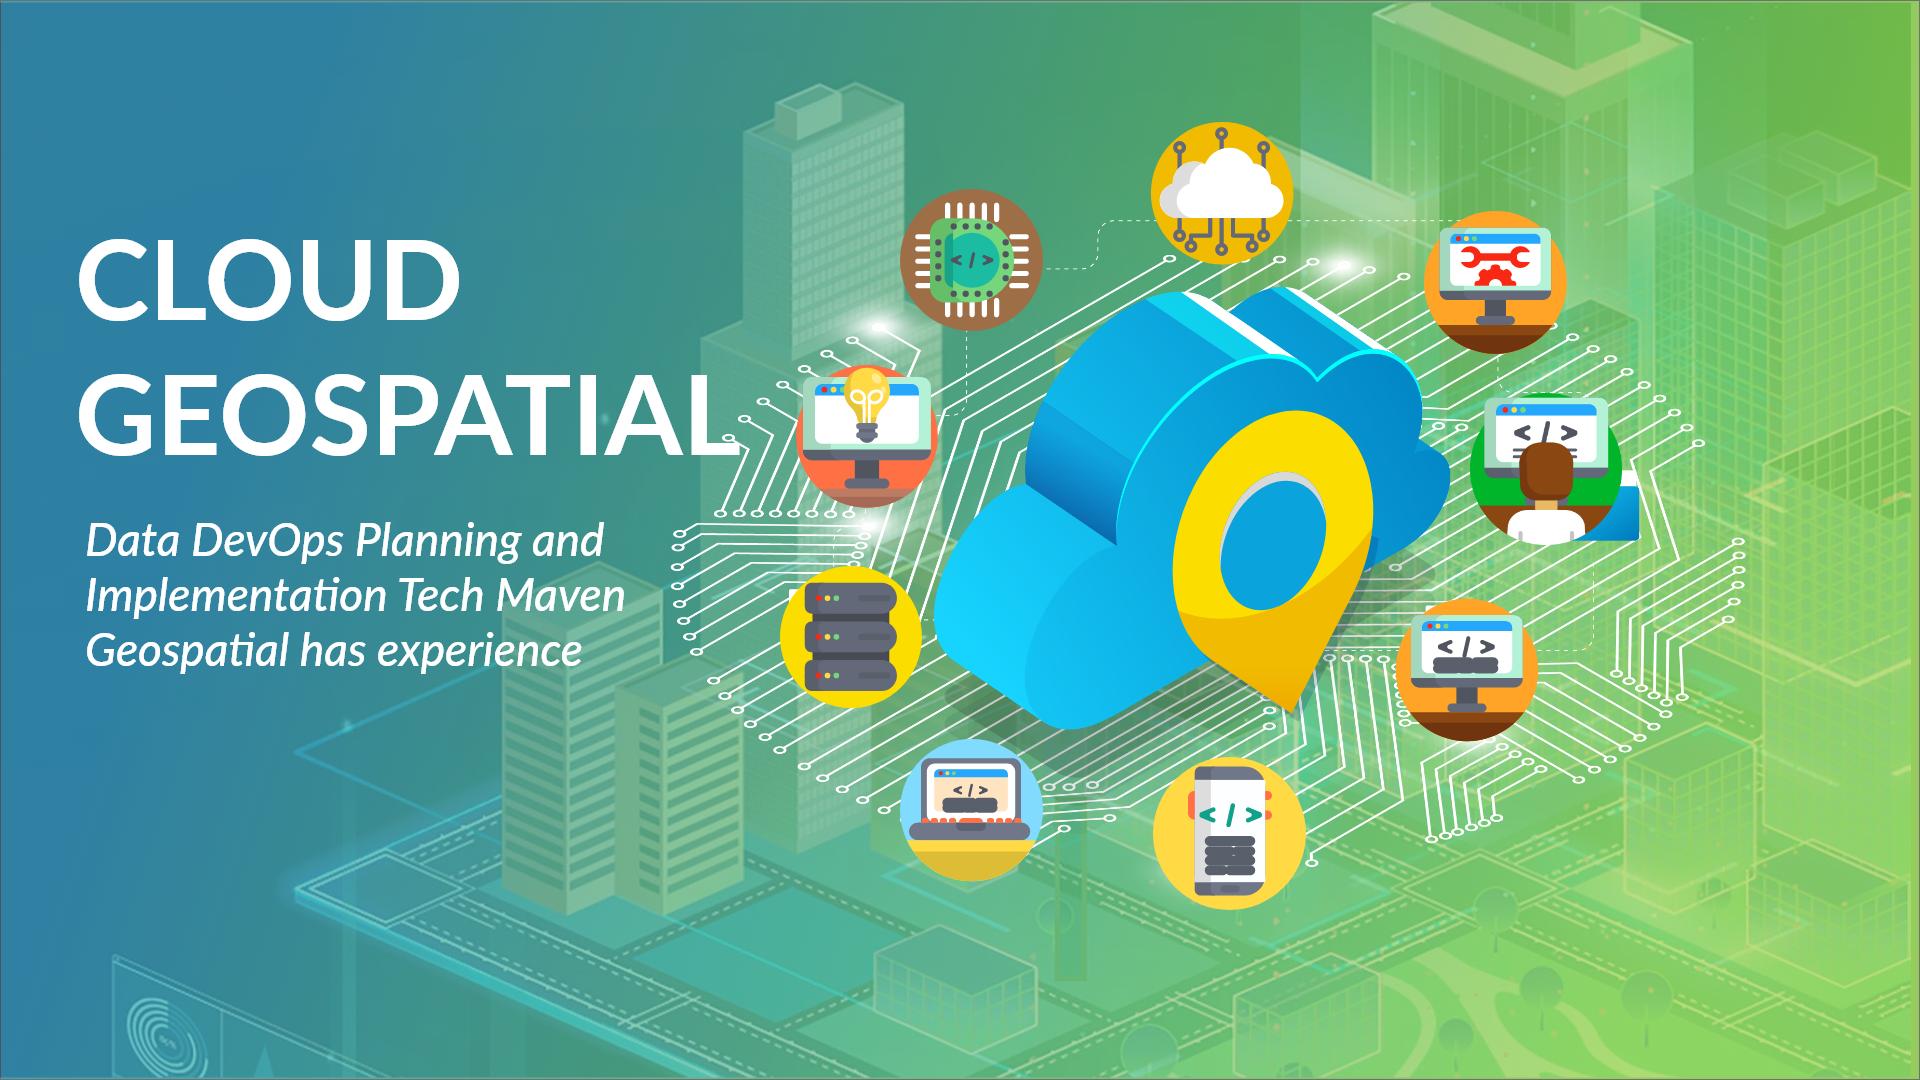 Cloud Geospatial Data DevOps Planning and Implementation